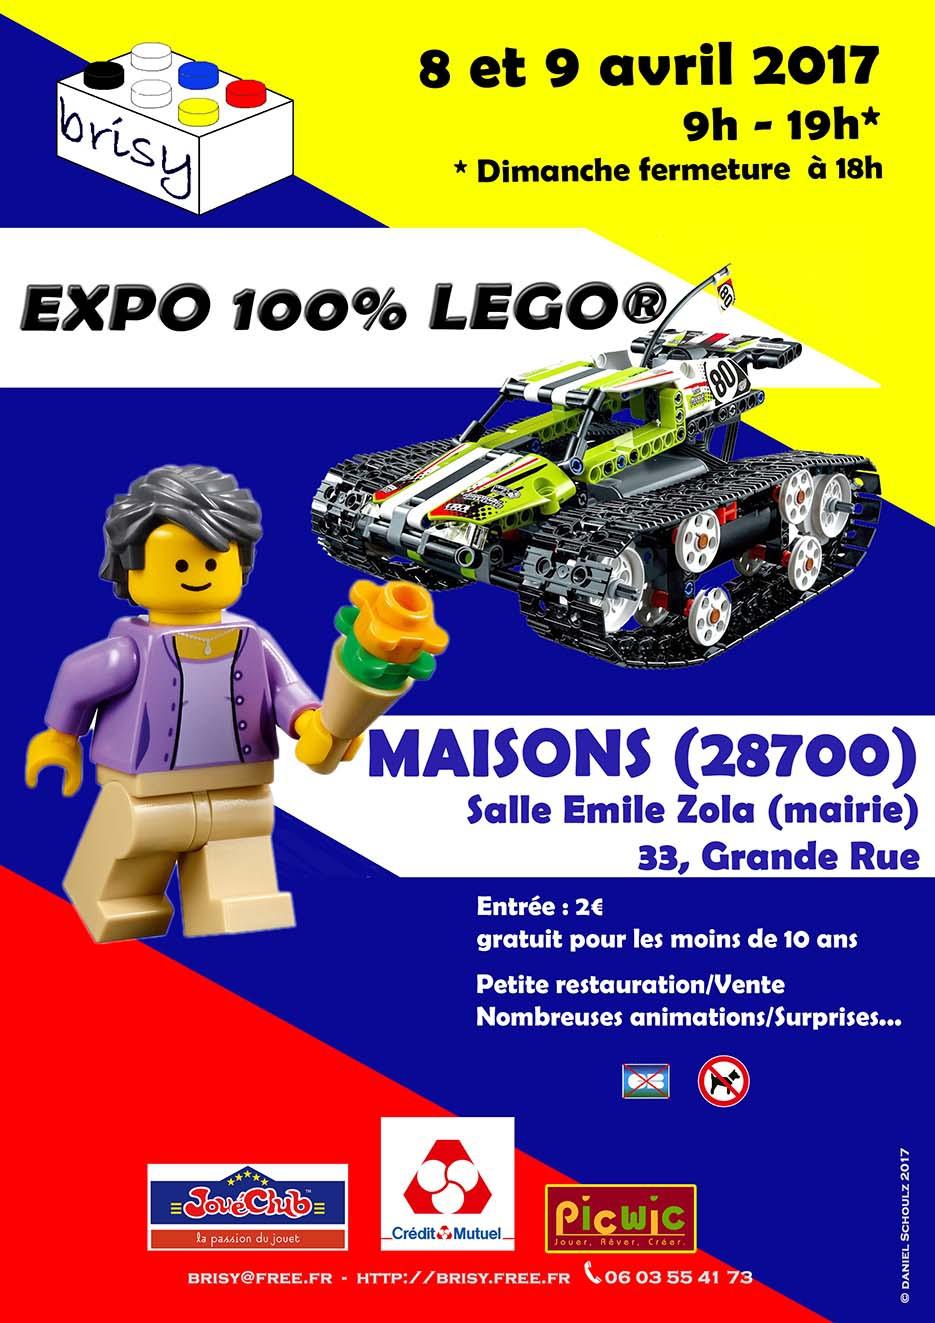 Legos Jouet Club Club Jouet Jouet Nijago Legos Legos Club Nijago Legos Nijago l1TFKcJ